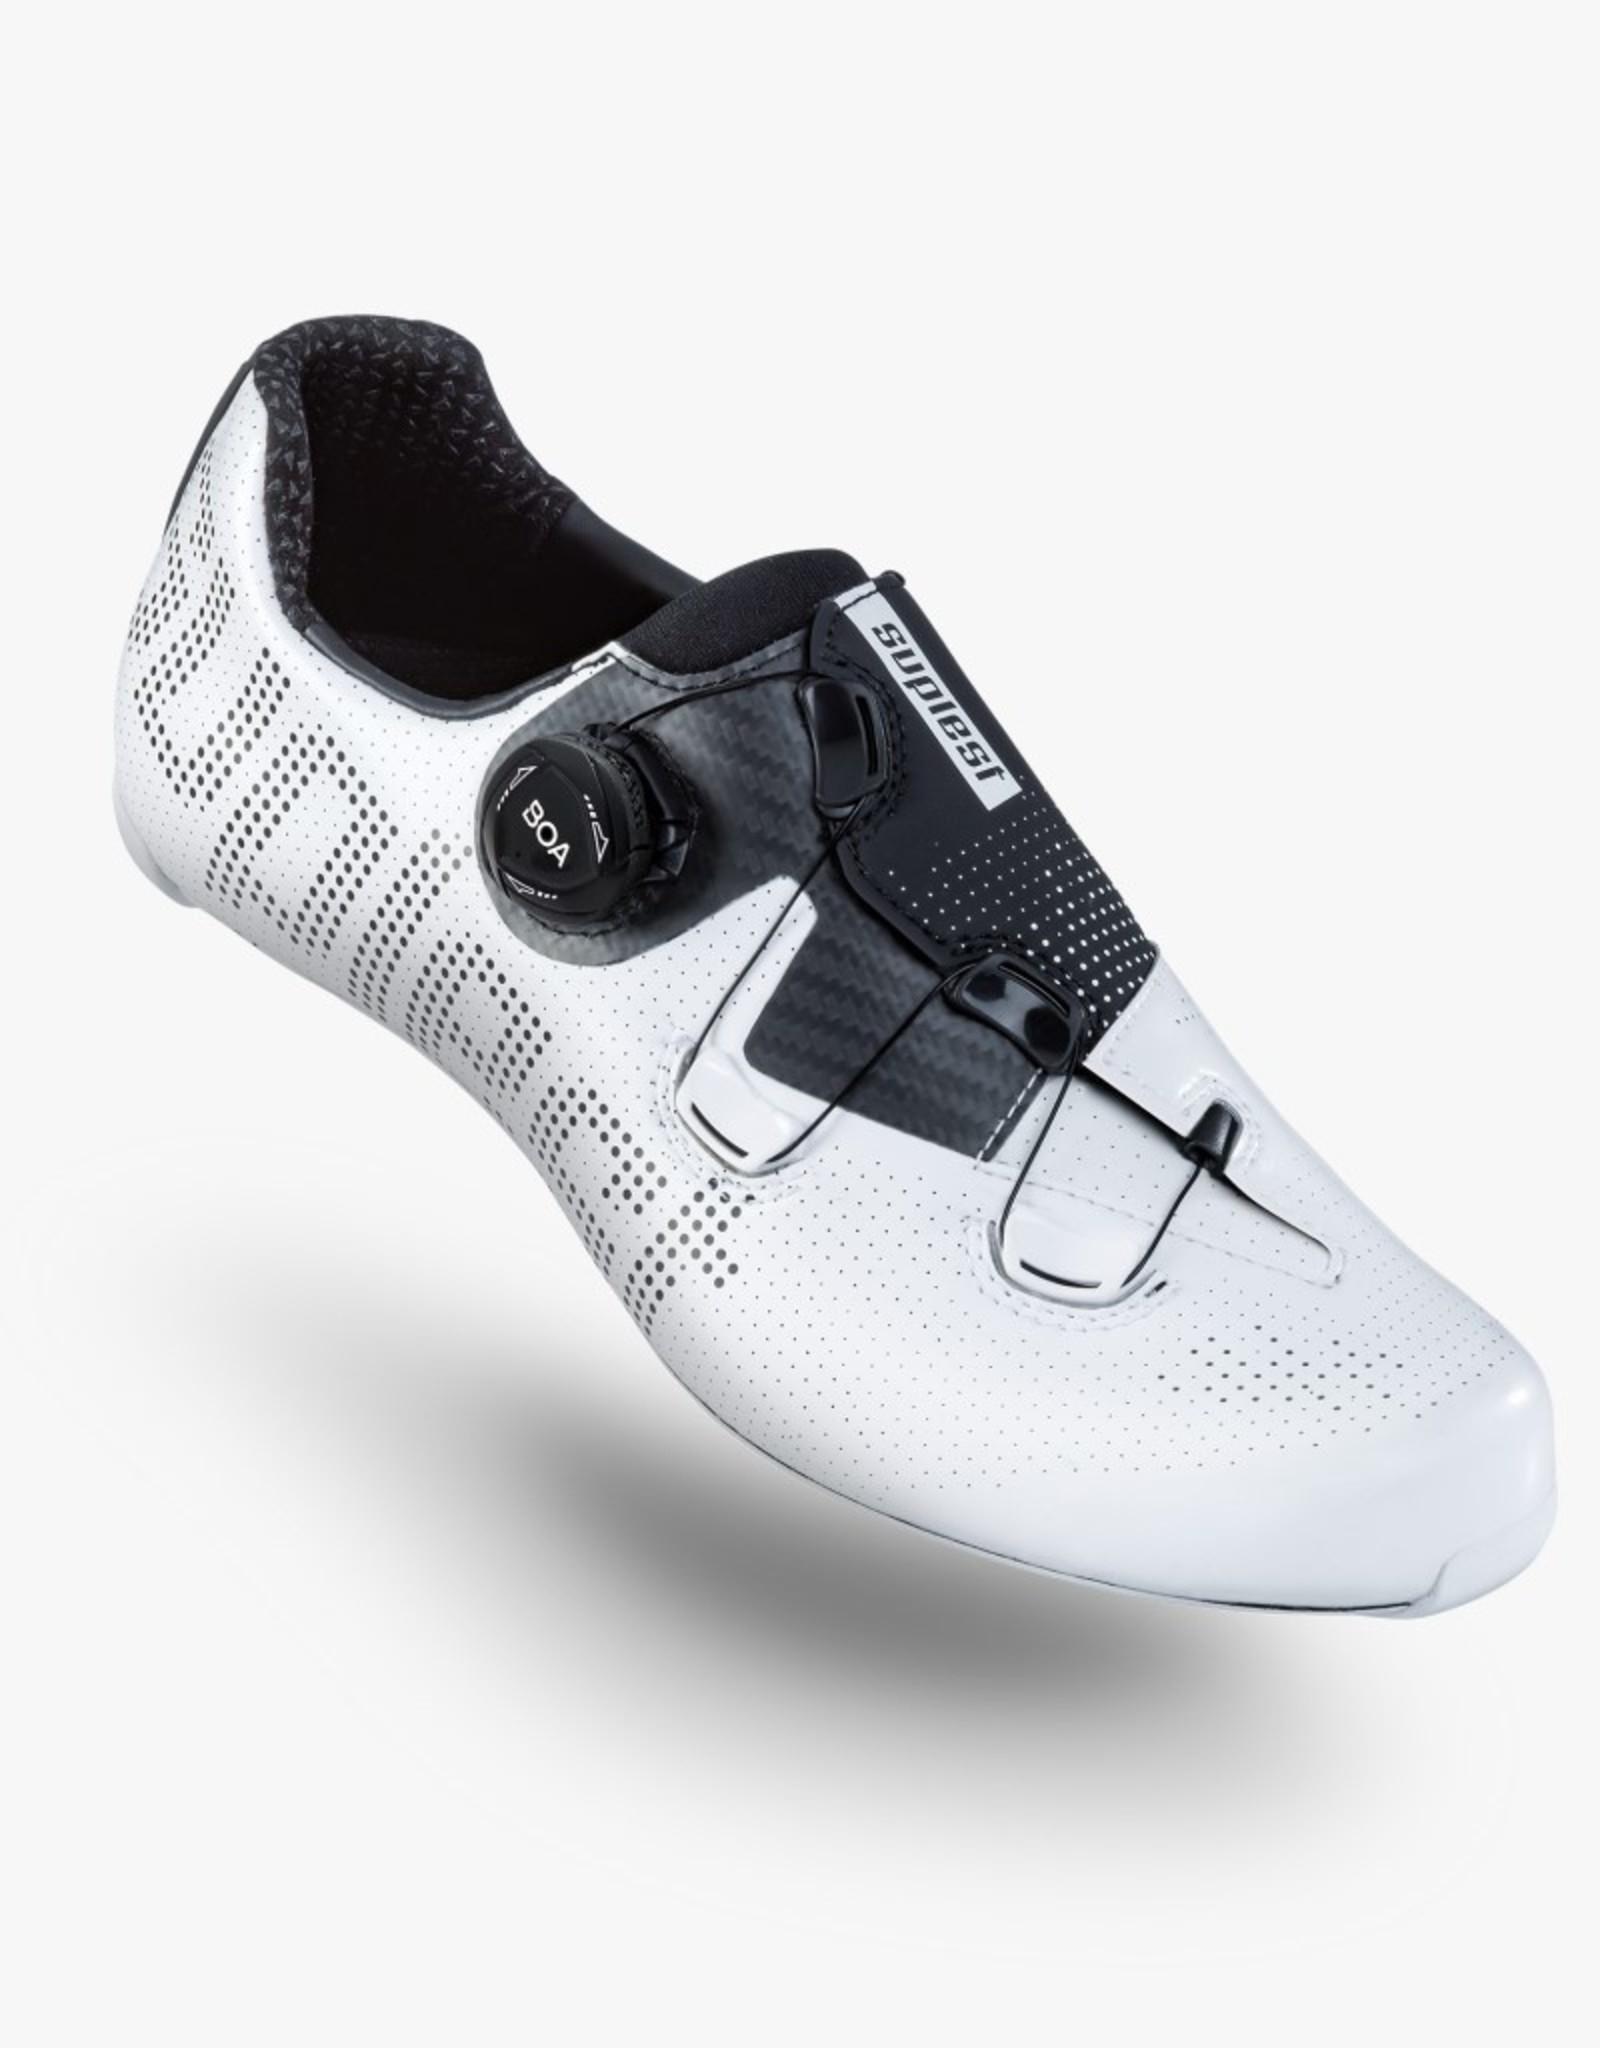 Suplest Fietsschoenen EDGE+ Road Performance - white/black